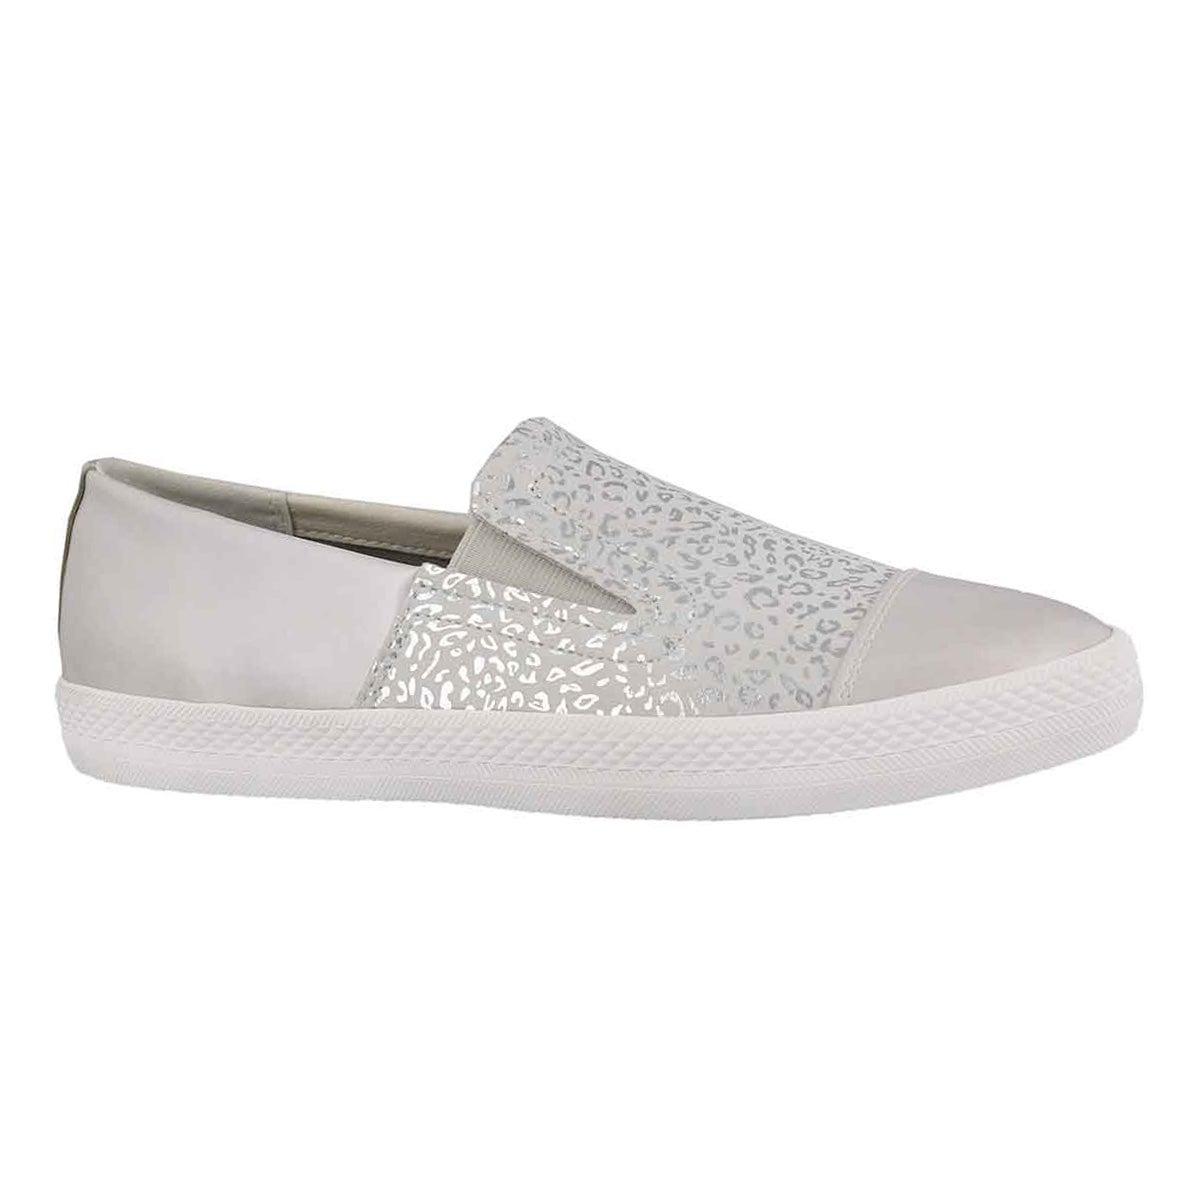 Women's GIYO off white slip on sneakers